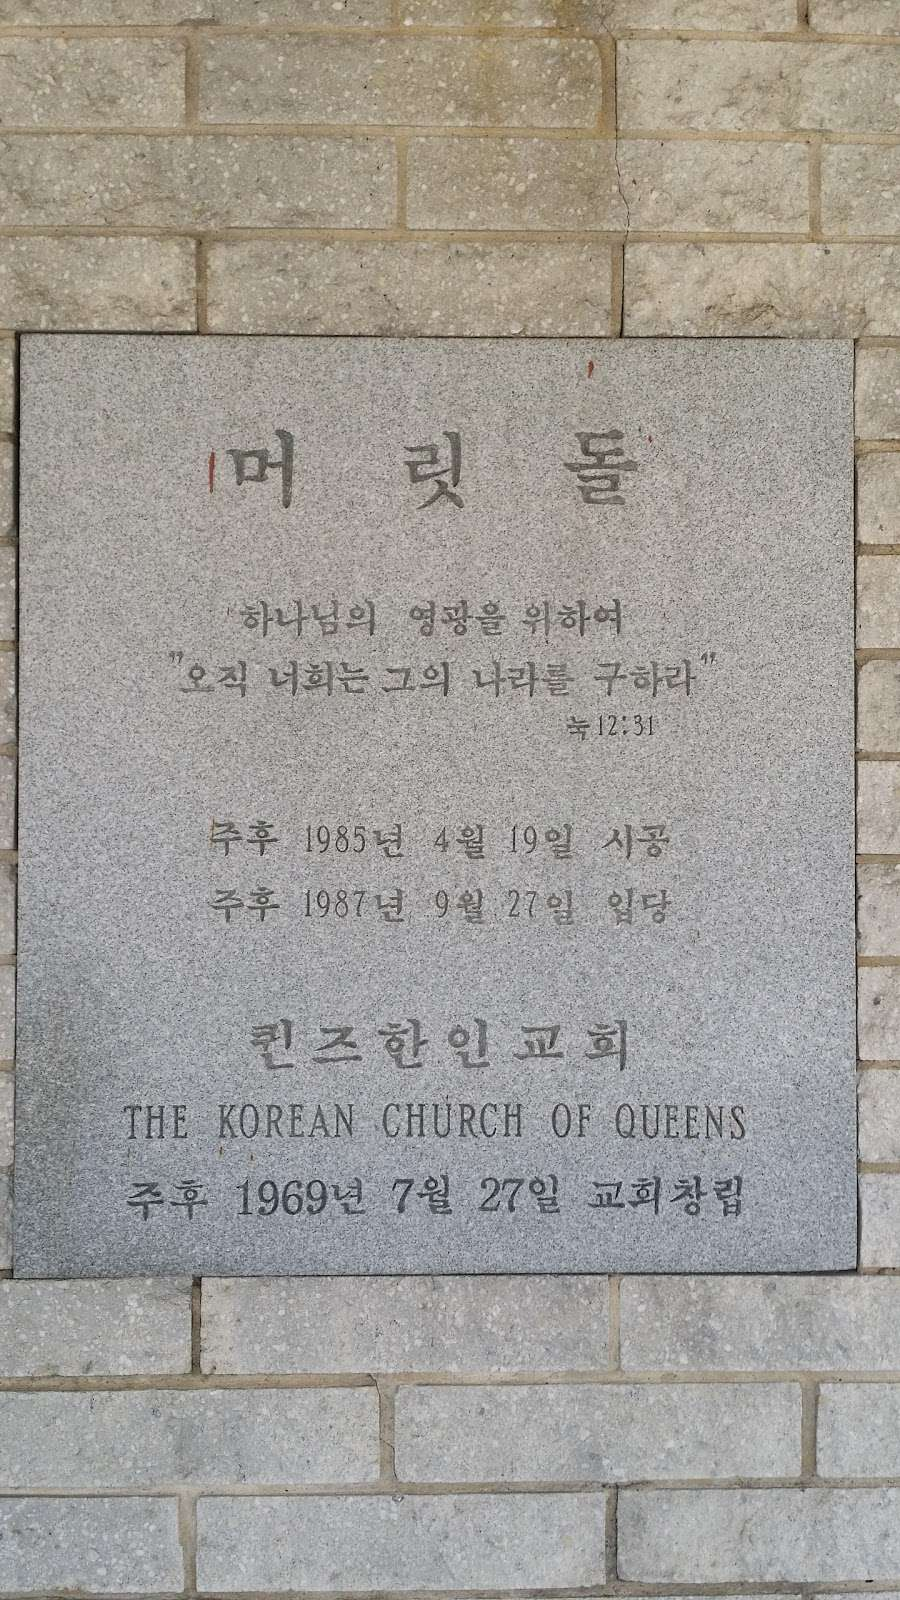 The Korean Church of Queens - church  | Photo 7 of 7 | Address: 8900 23rd Ave, East Elmhurst, NY 11369, USA | Phone: (718) 672-1150